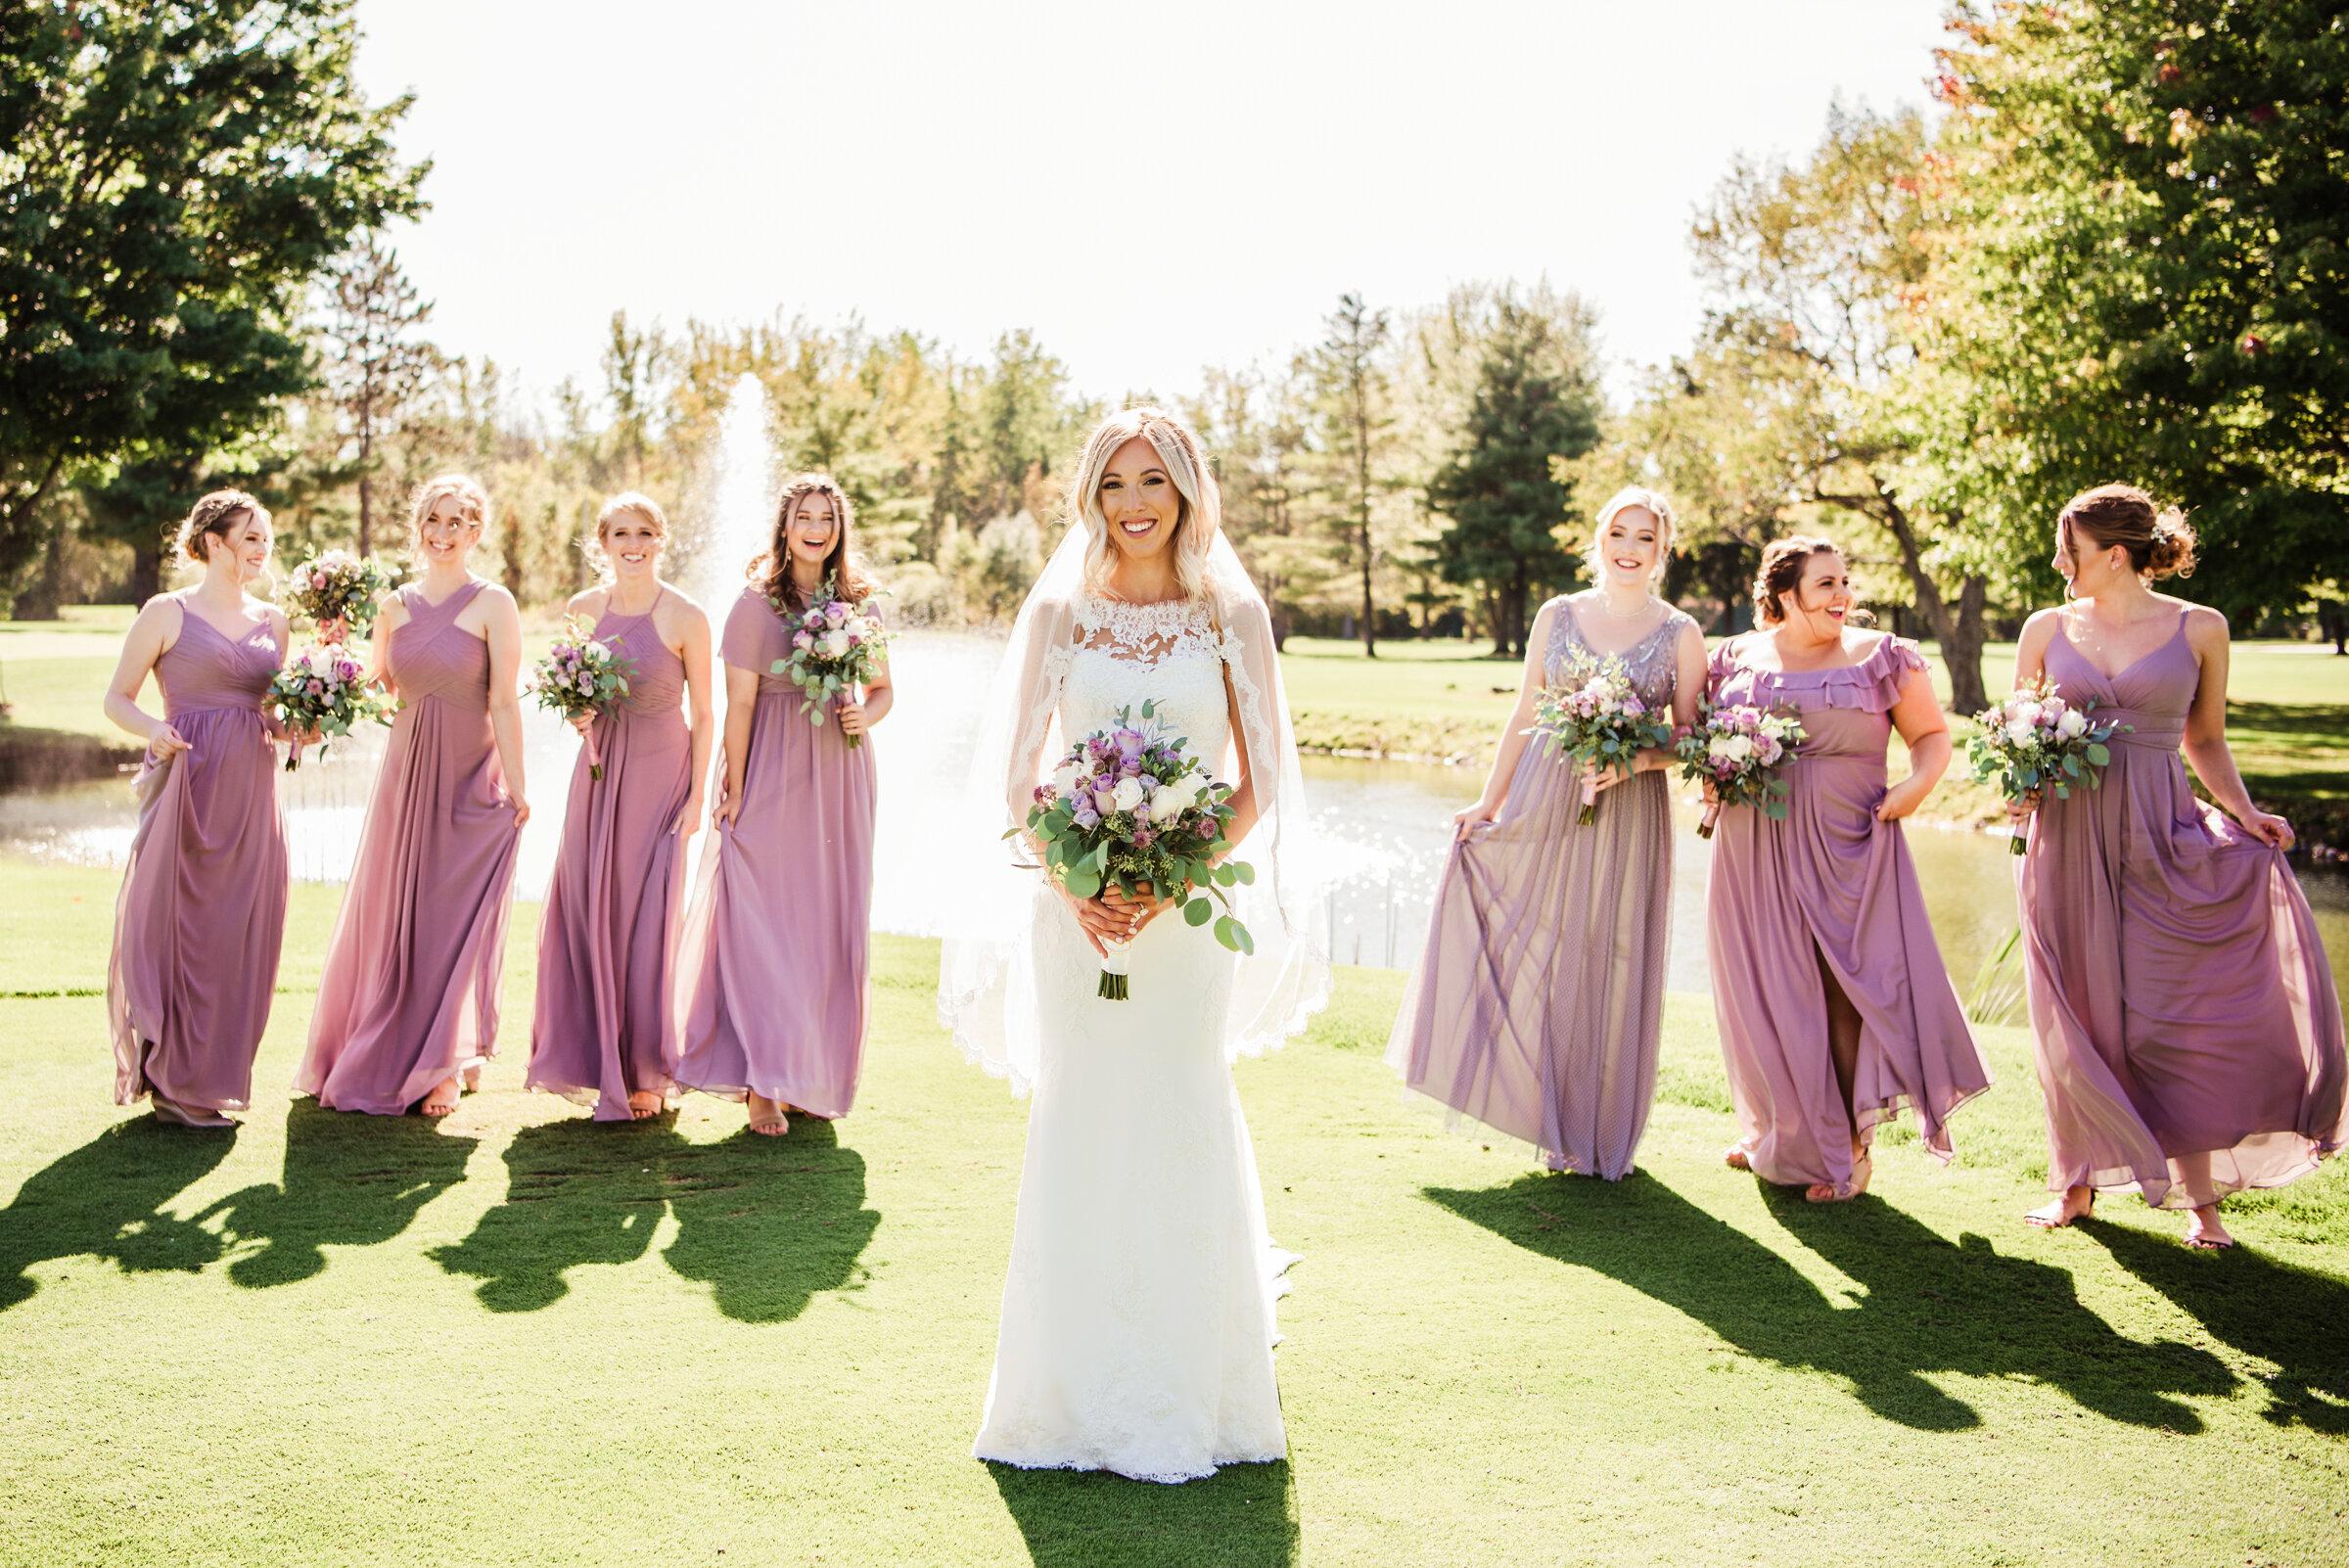 Deerfield_Country_Club_Rochester_Wedding_JILL_STUDIO_Rochester_NY_Photographer_DSC_6272.jpg